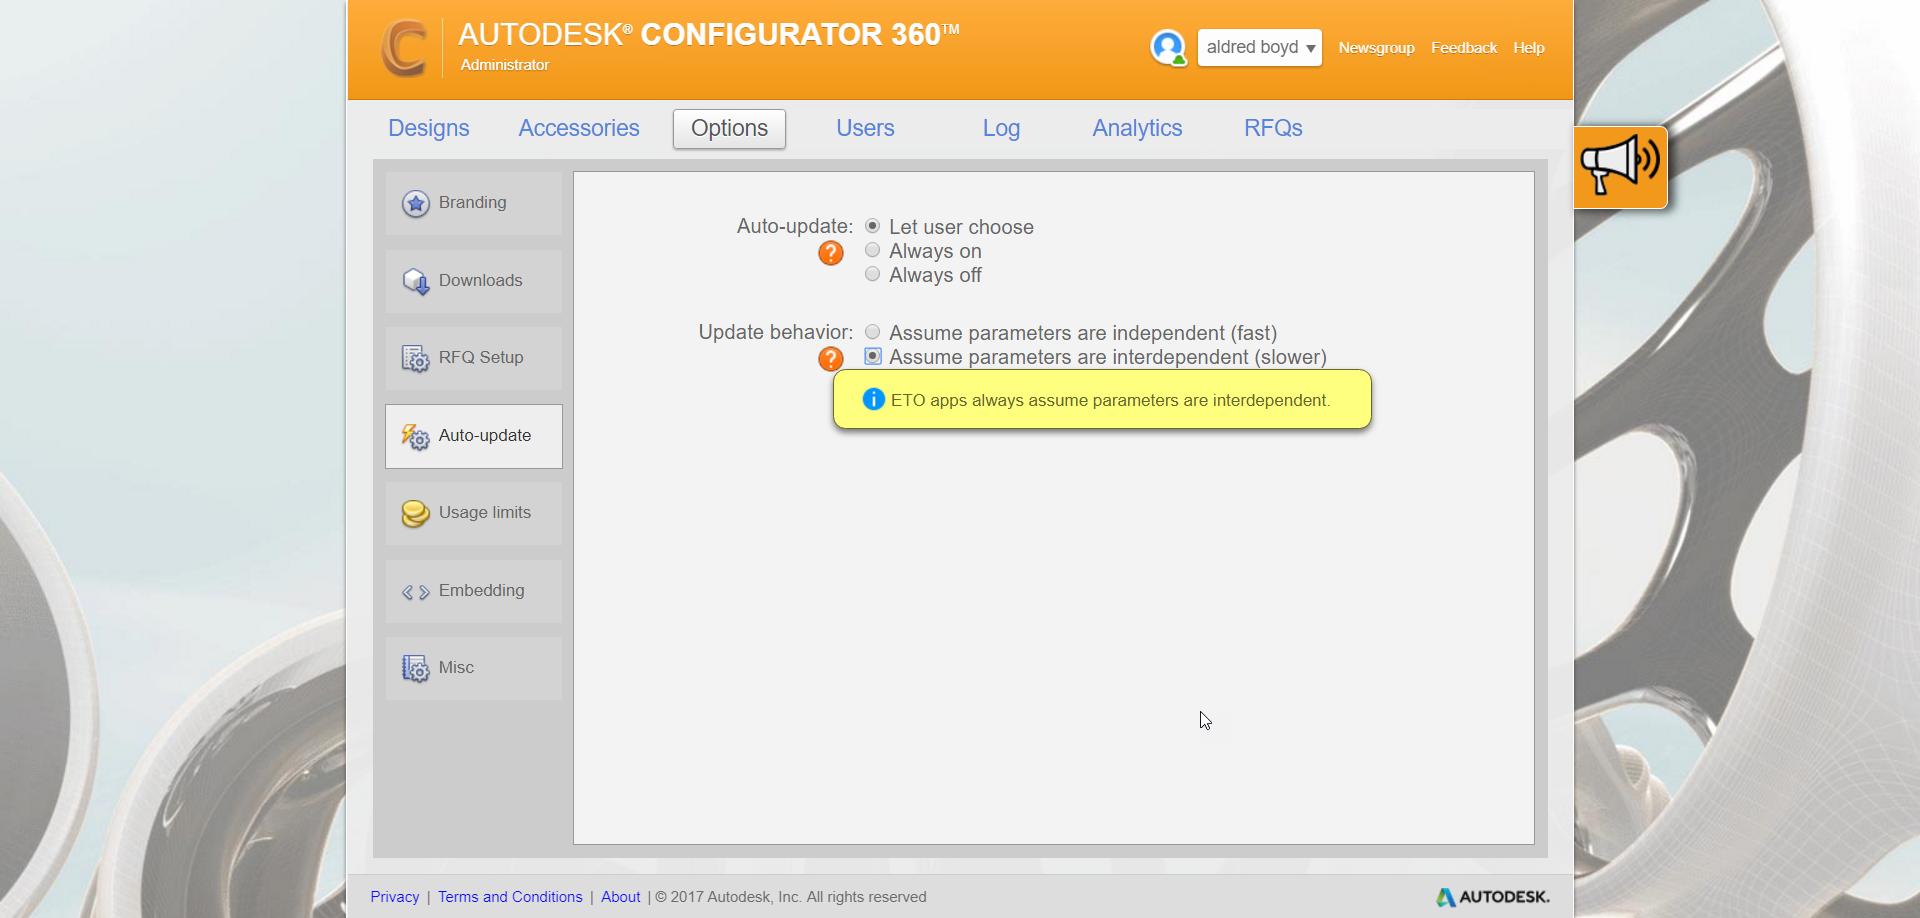 2-16 Configurator 360 - Auto update and usage updates